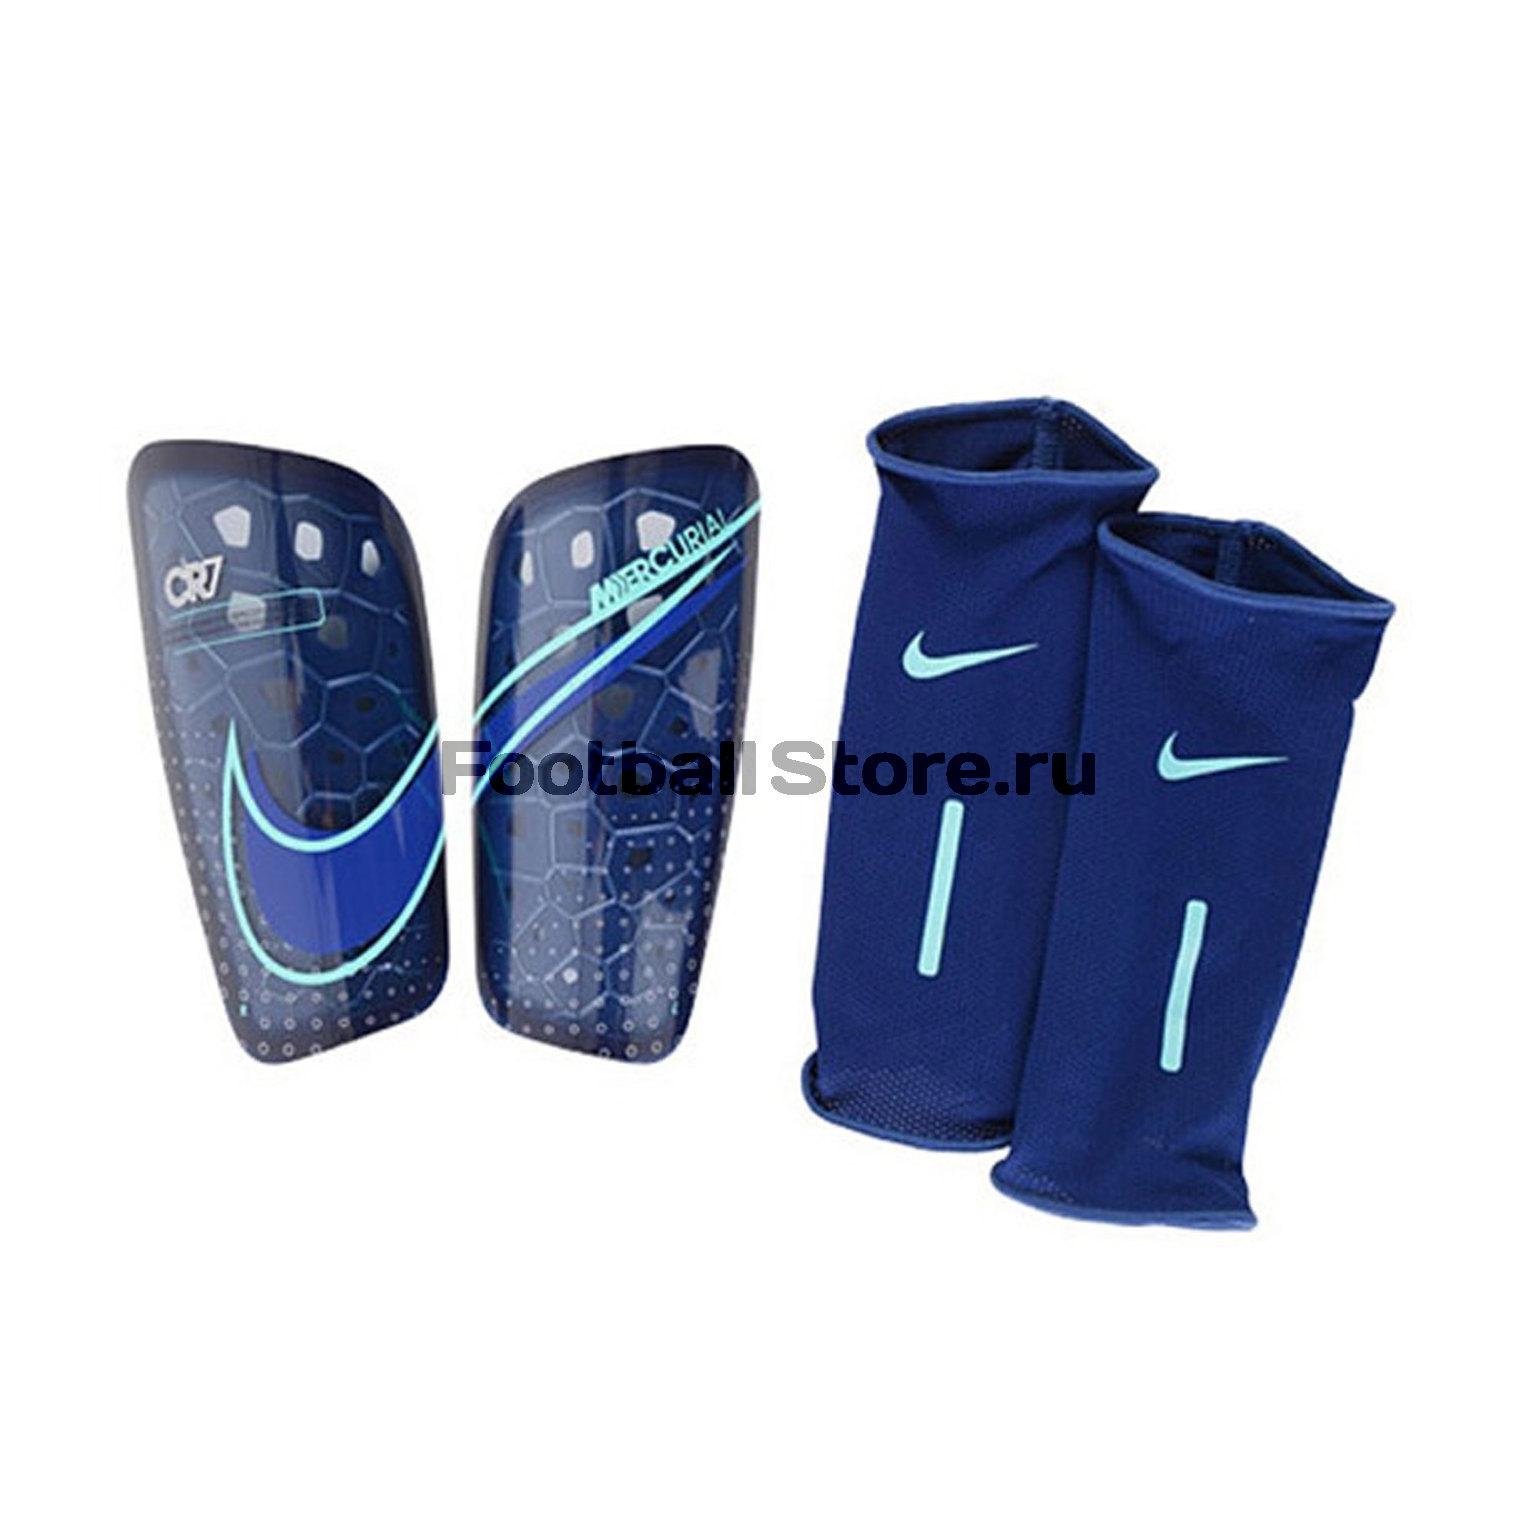 Щитки Nike CR7 Mercurial Lite CQ7654-492 бутсы nike mercurial victory cr7 indoor